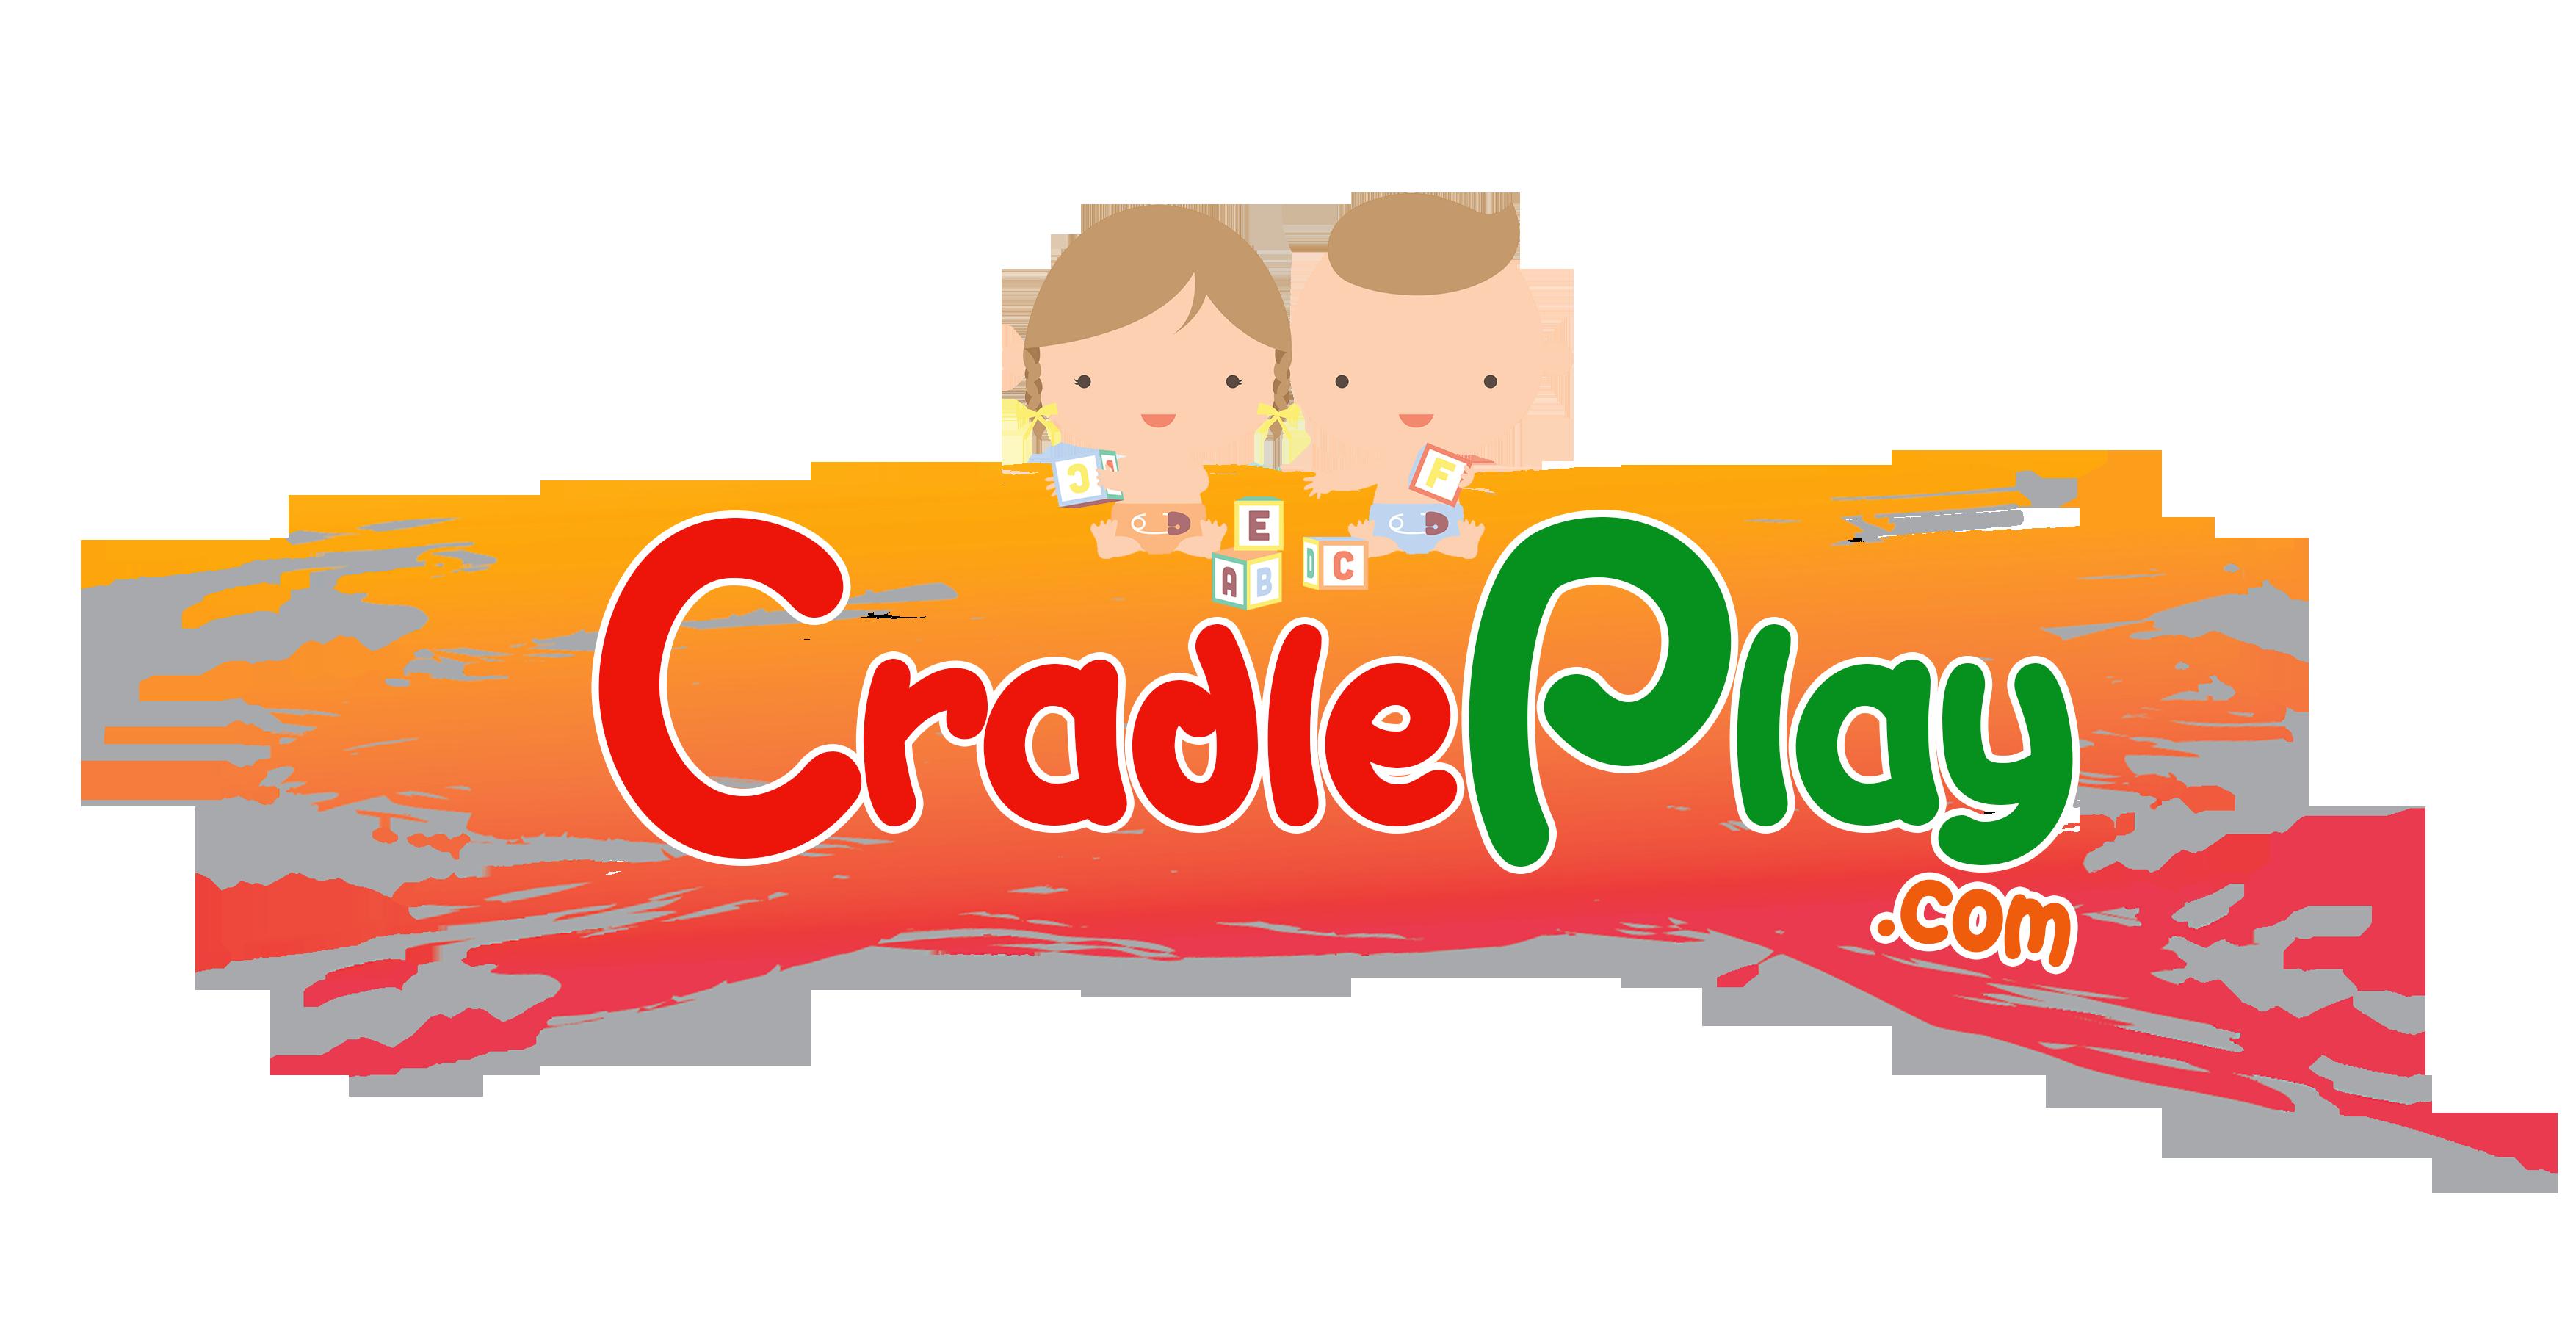 Clipart toys toy shelf. Educational cradleplay com